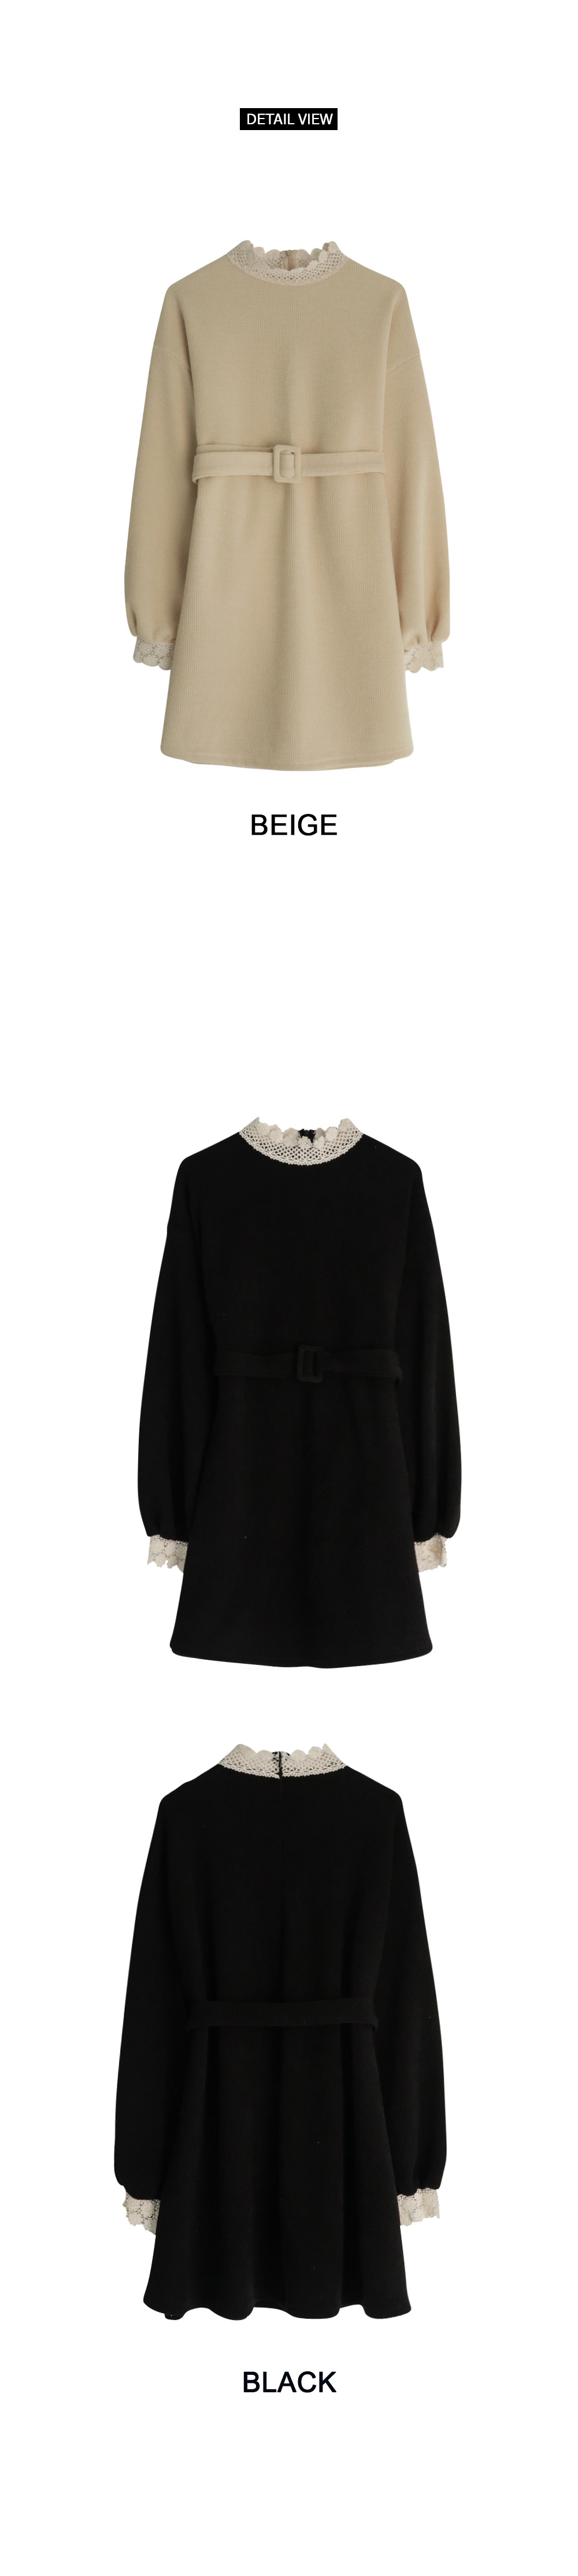 Lace Belt Dress SET